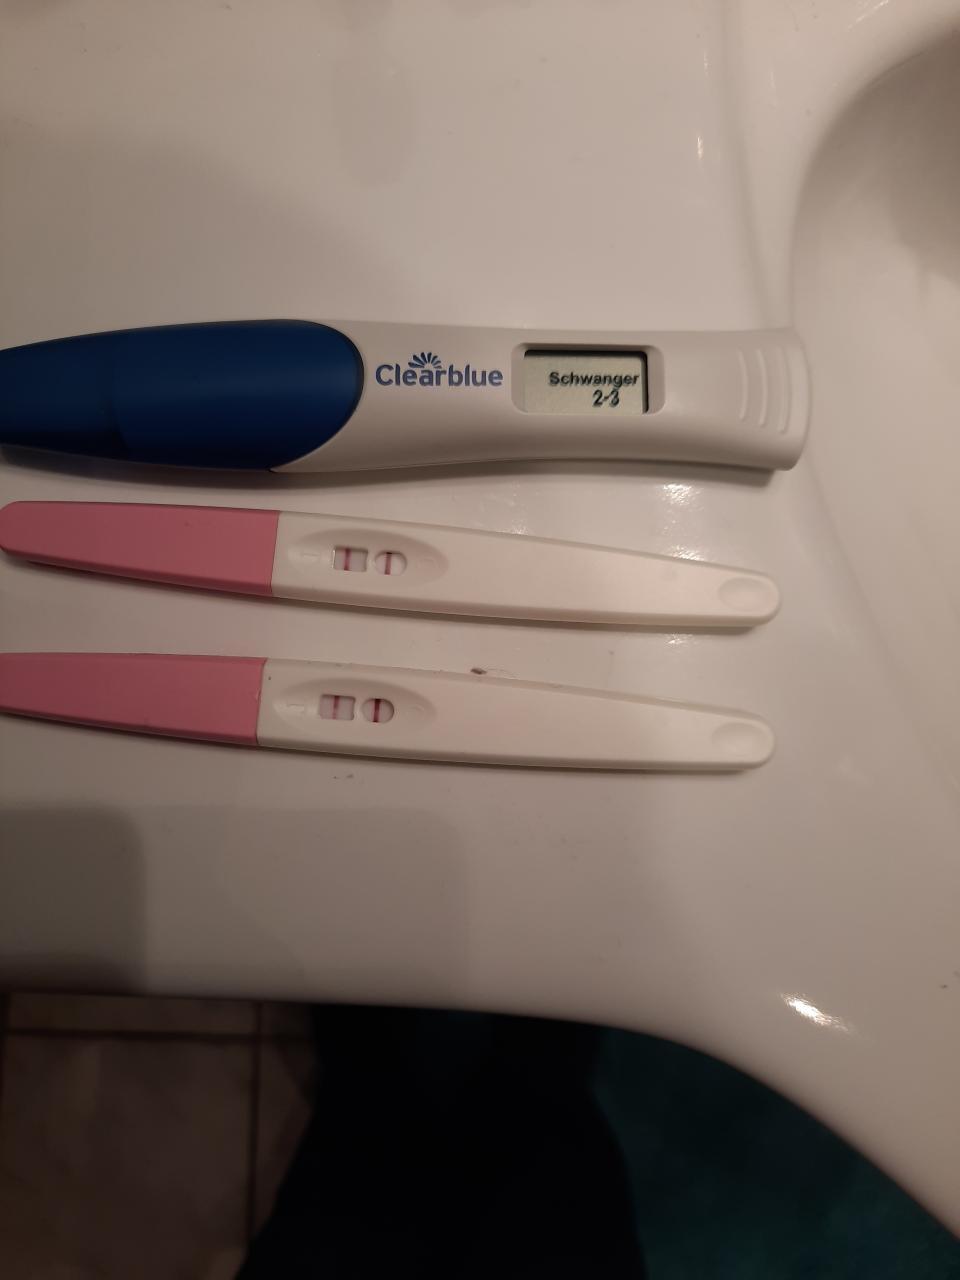 Action Schwangerschaftstest